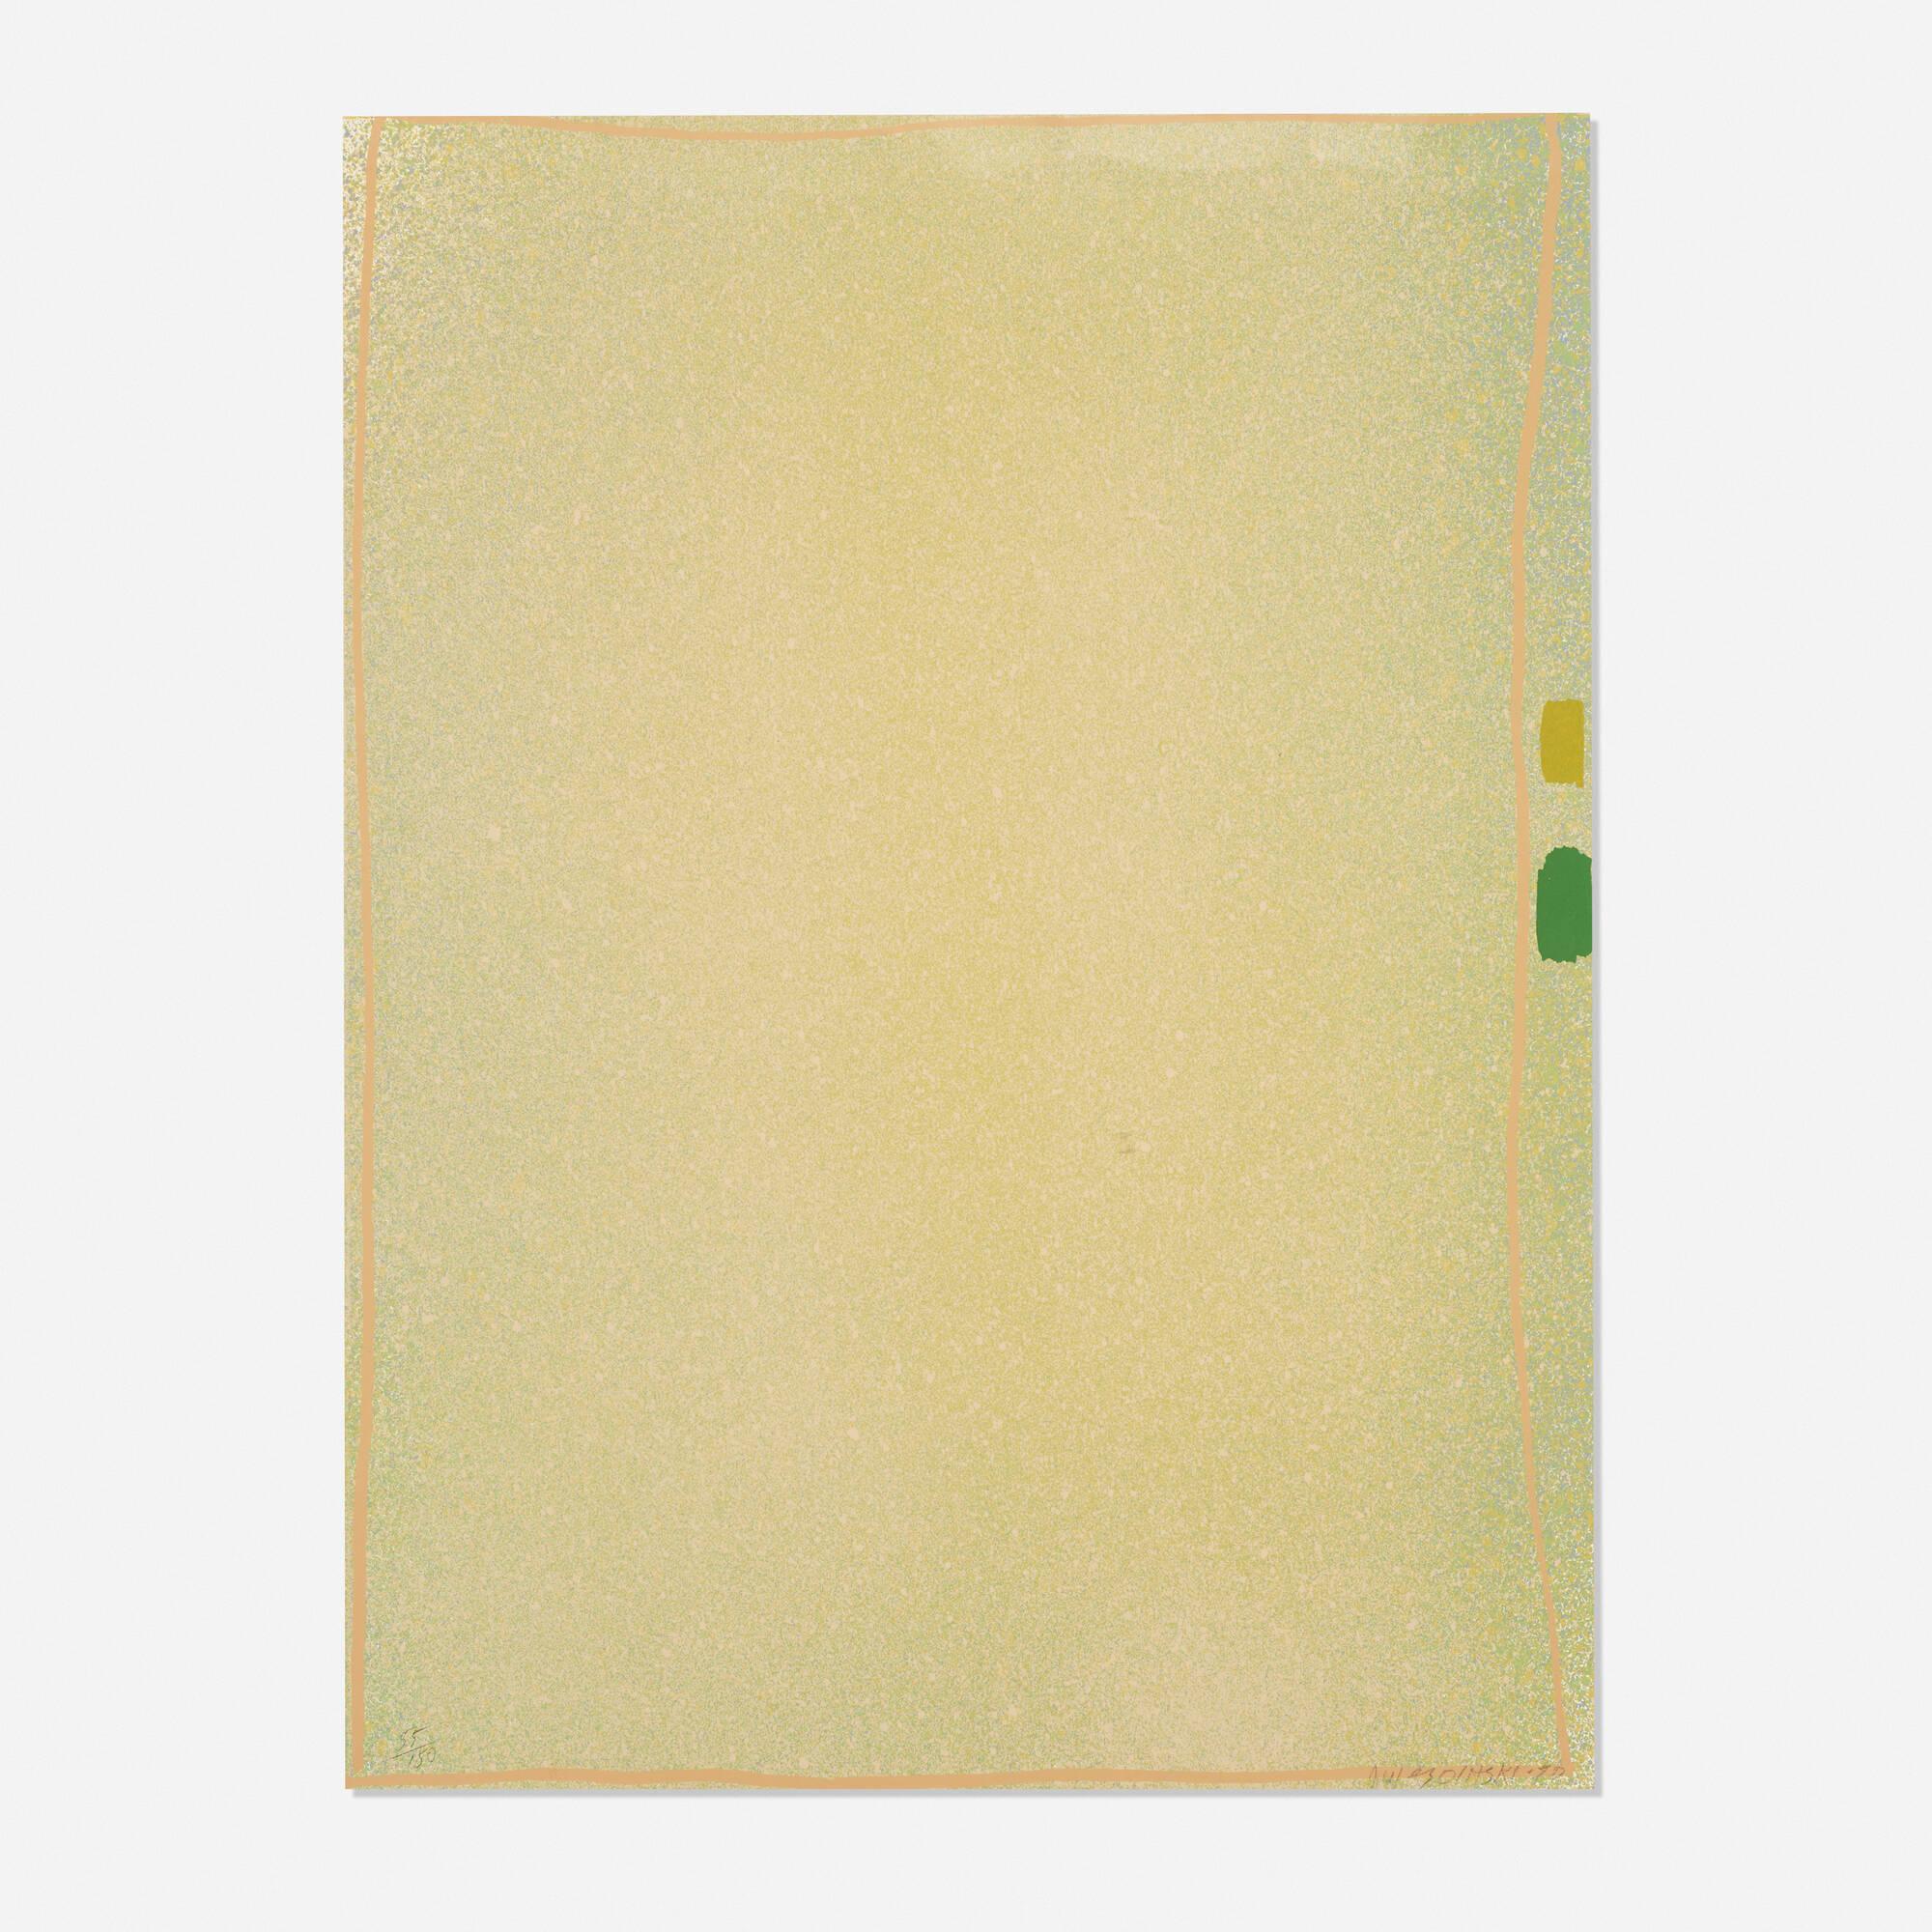 108: Jules Olitski / Graphite Suite I (Yellow/Green with Flesh) (1 of 1)